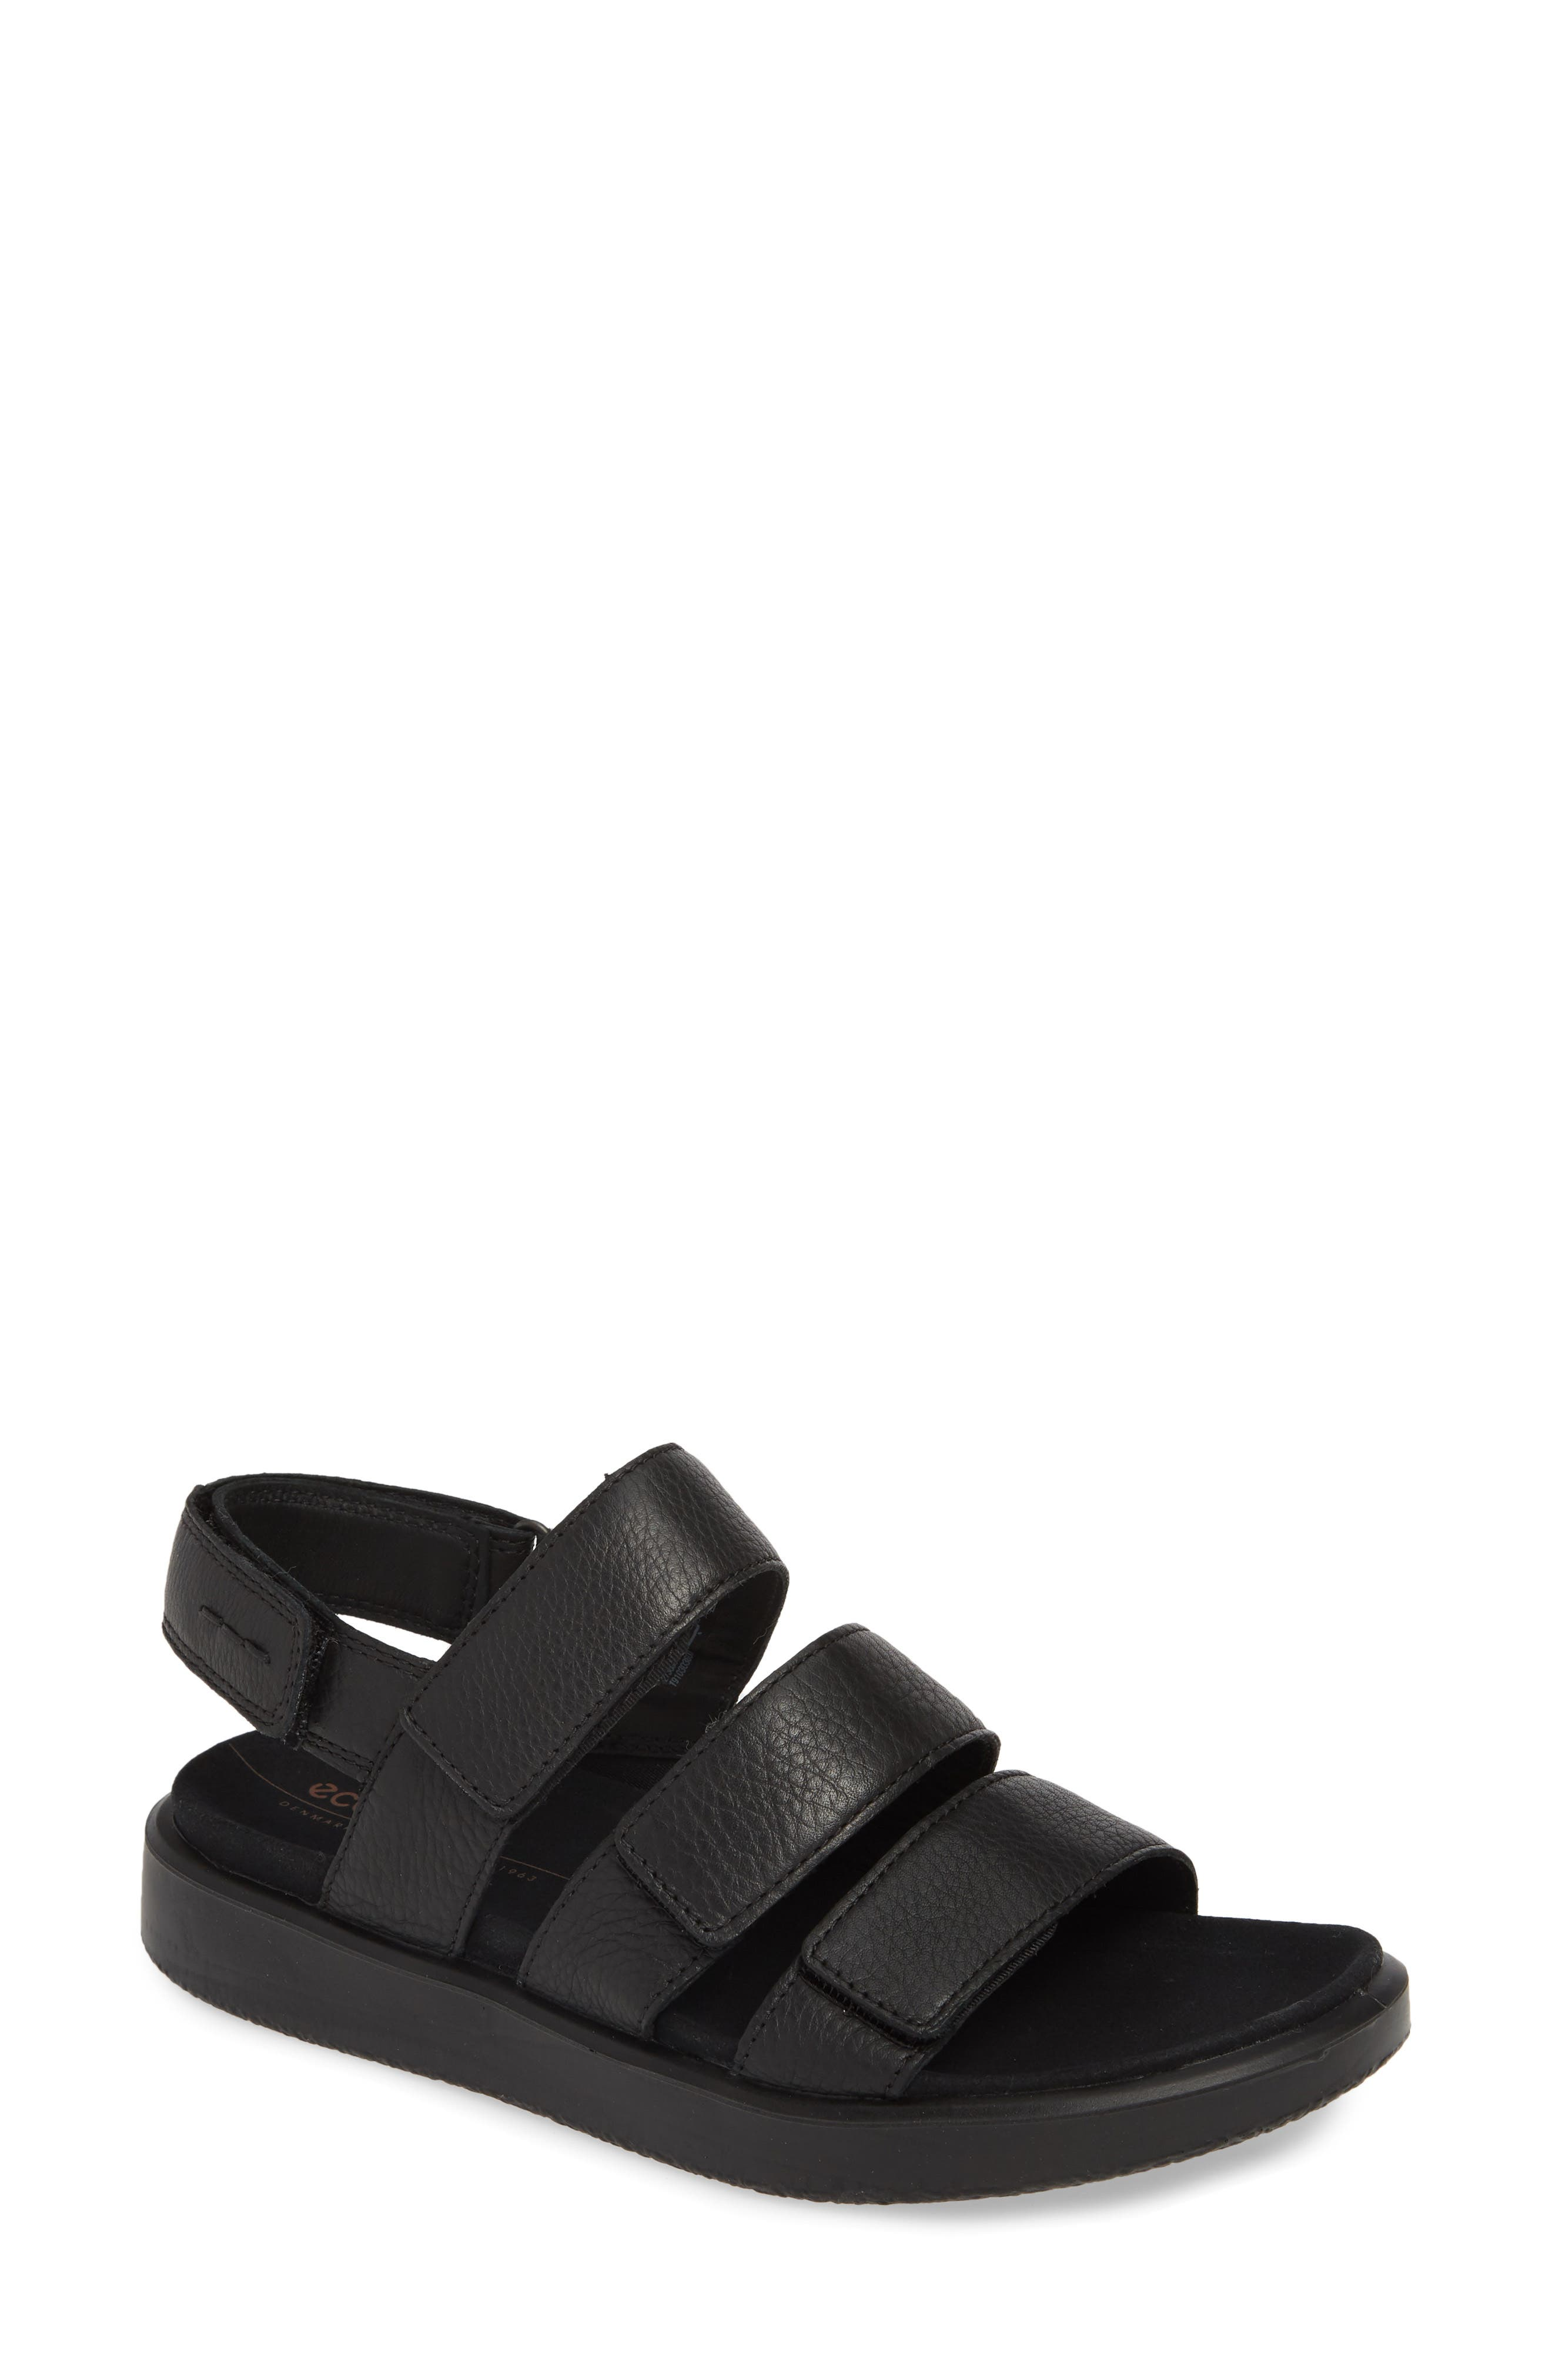 ecco sandals womens nordstrom